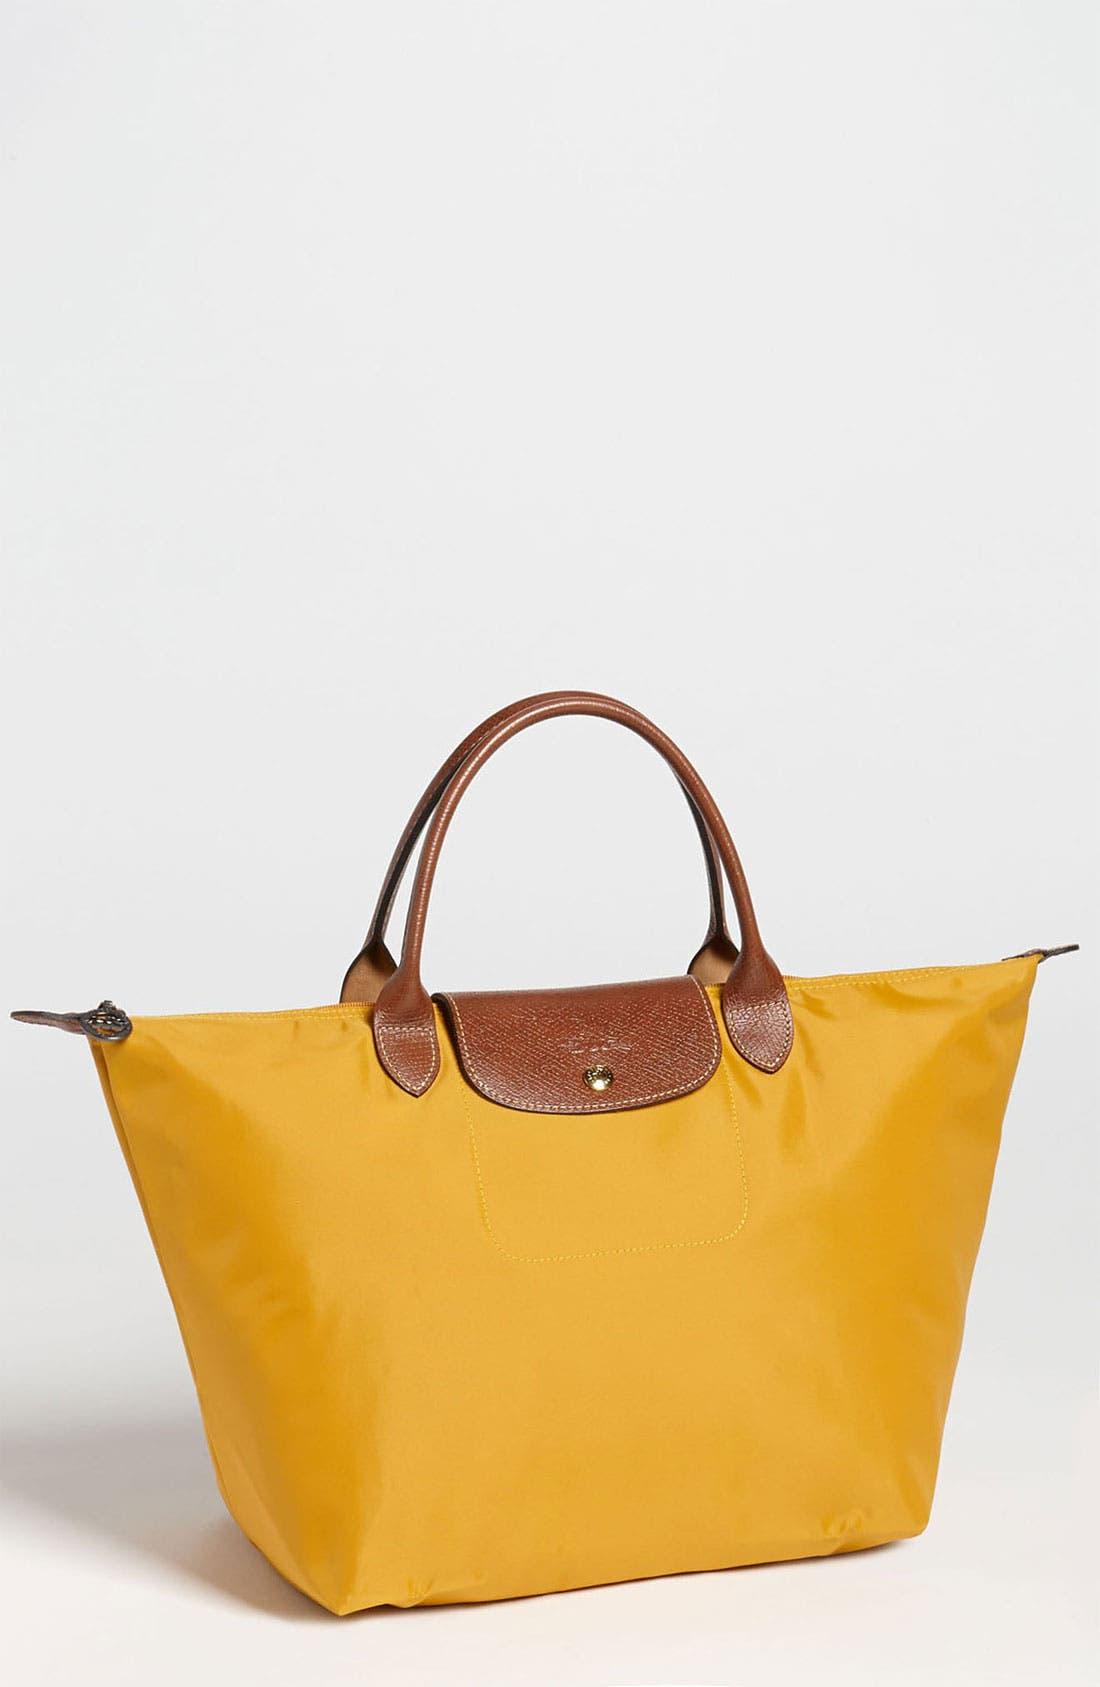 Alternate Image 1 Selected - Longchamp 'Medium Le Pliage' Nylon Tote